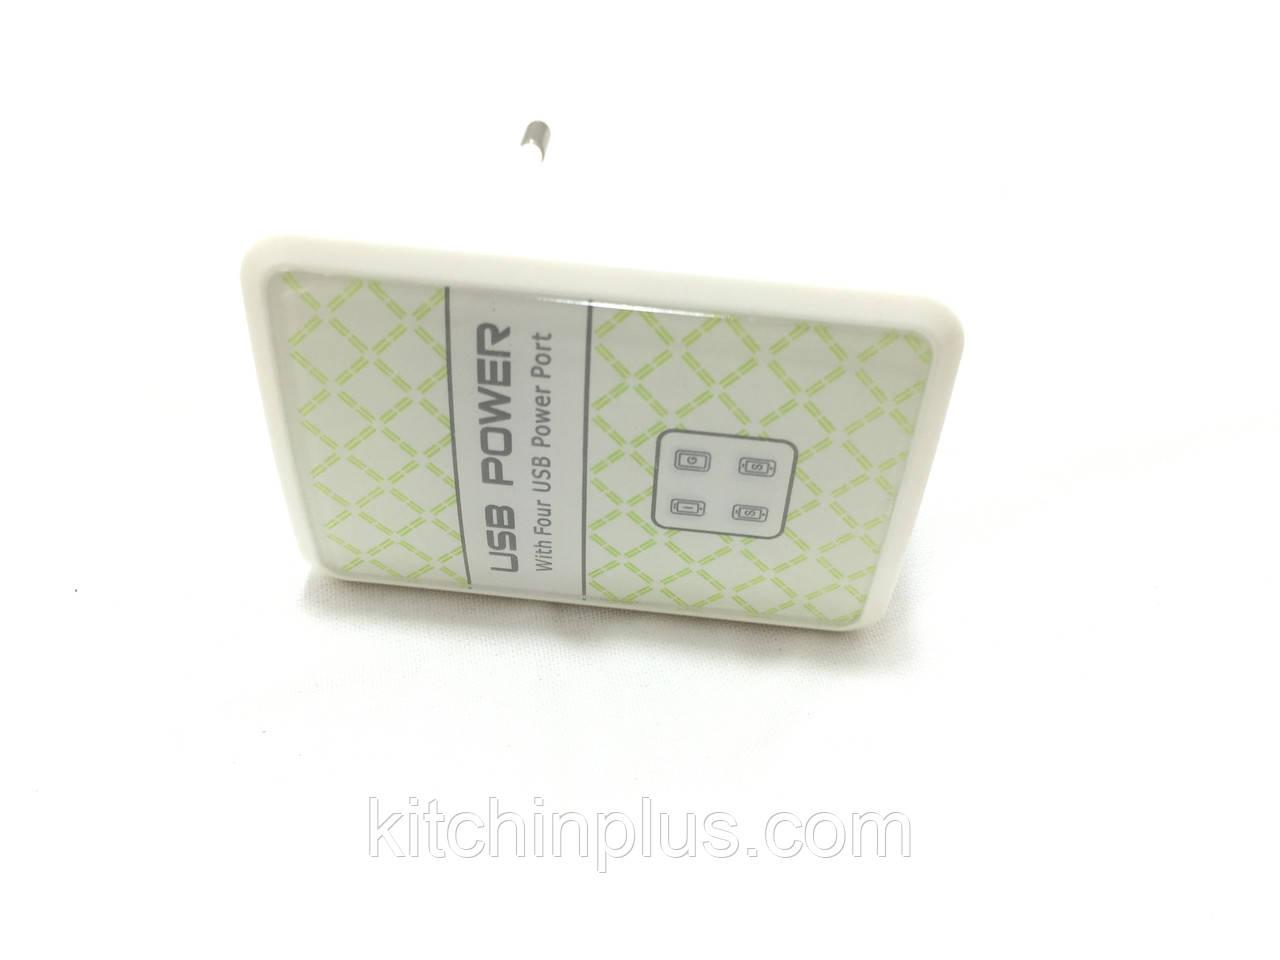 USB-зарядка USB Power Adapter